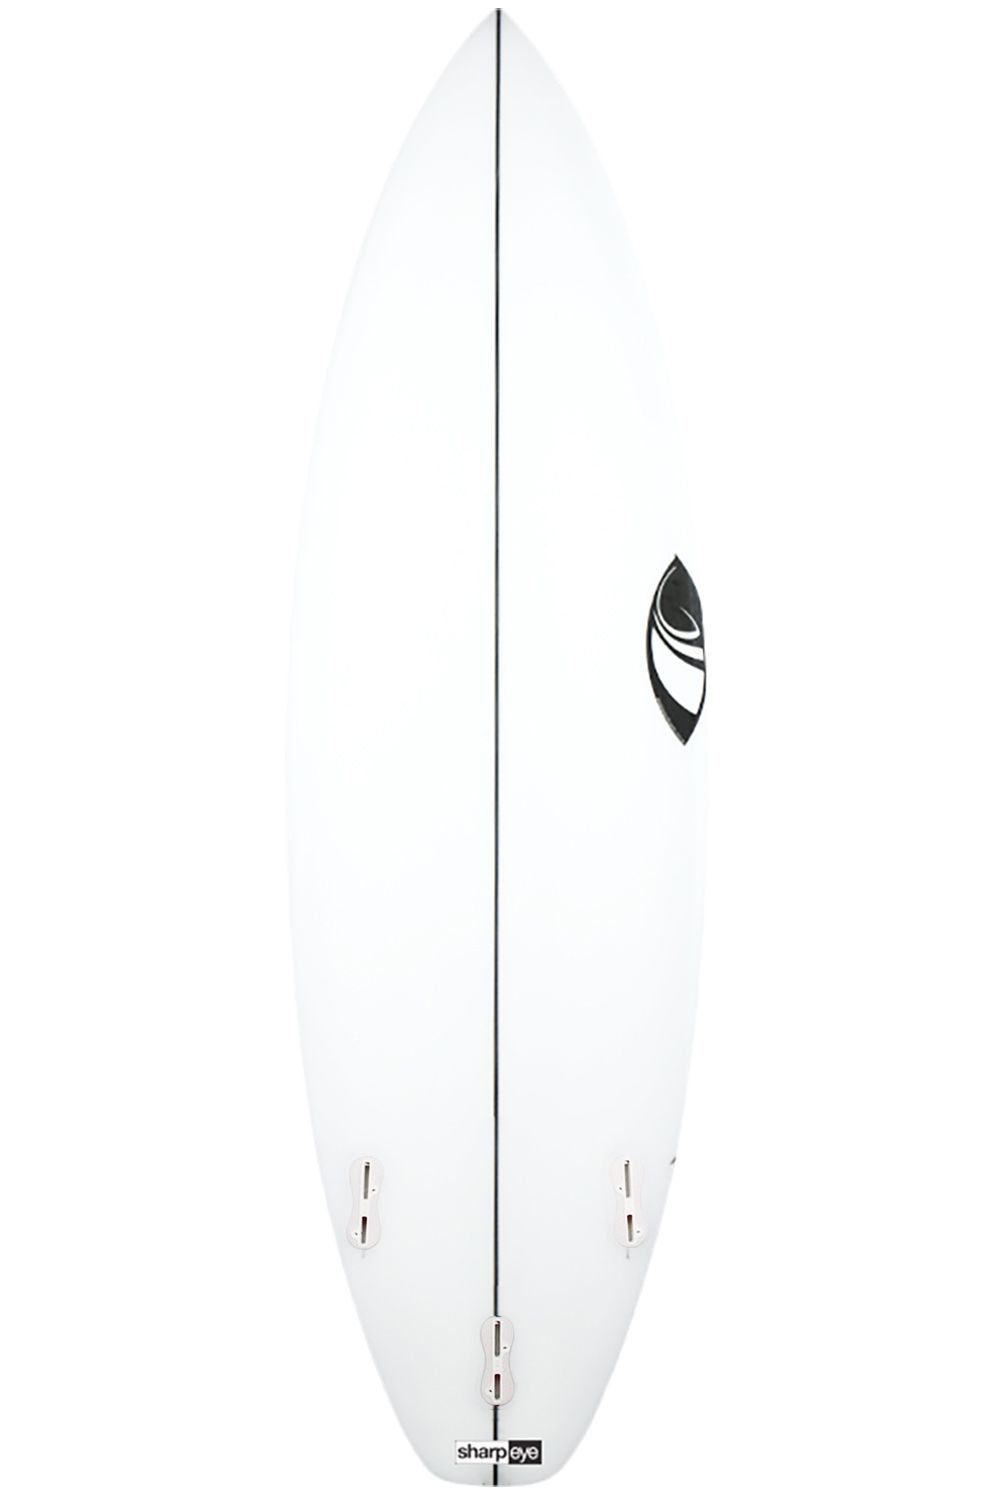 Prancha Surf Sharpeye STORMS 5'11 Squash Tail - White FCS II 5ft11